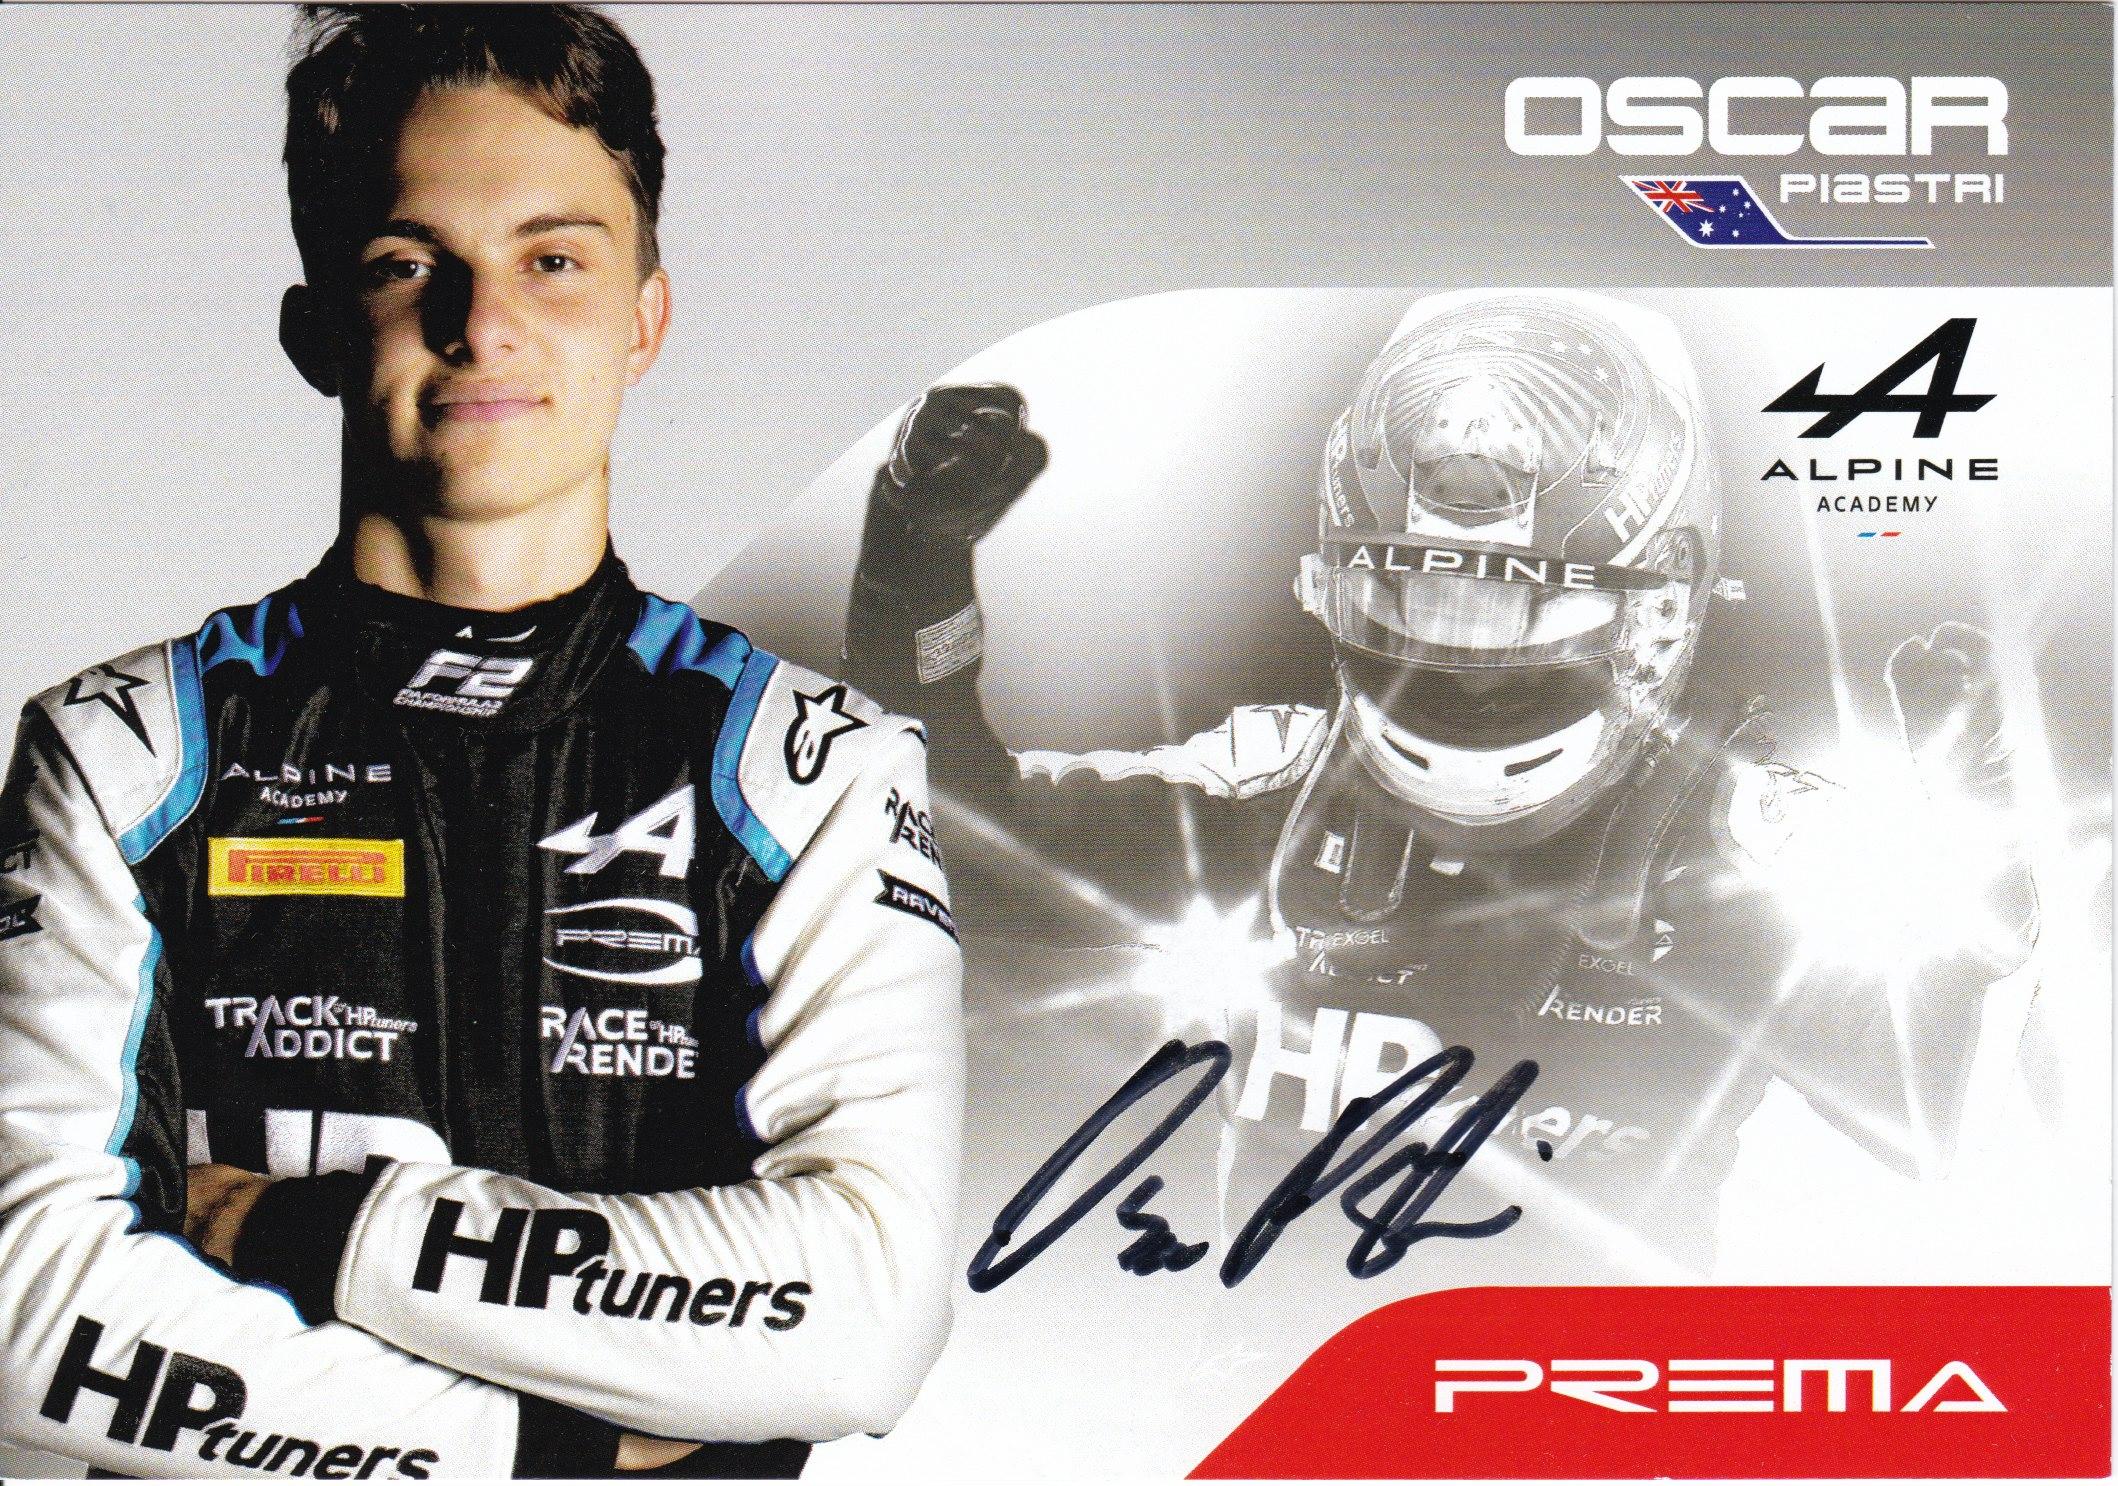 Oscar Piastri Prema Powerteam 2021